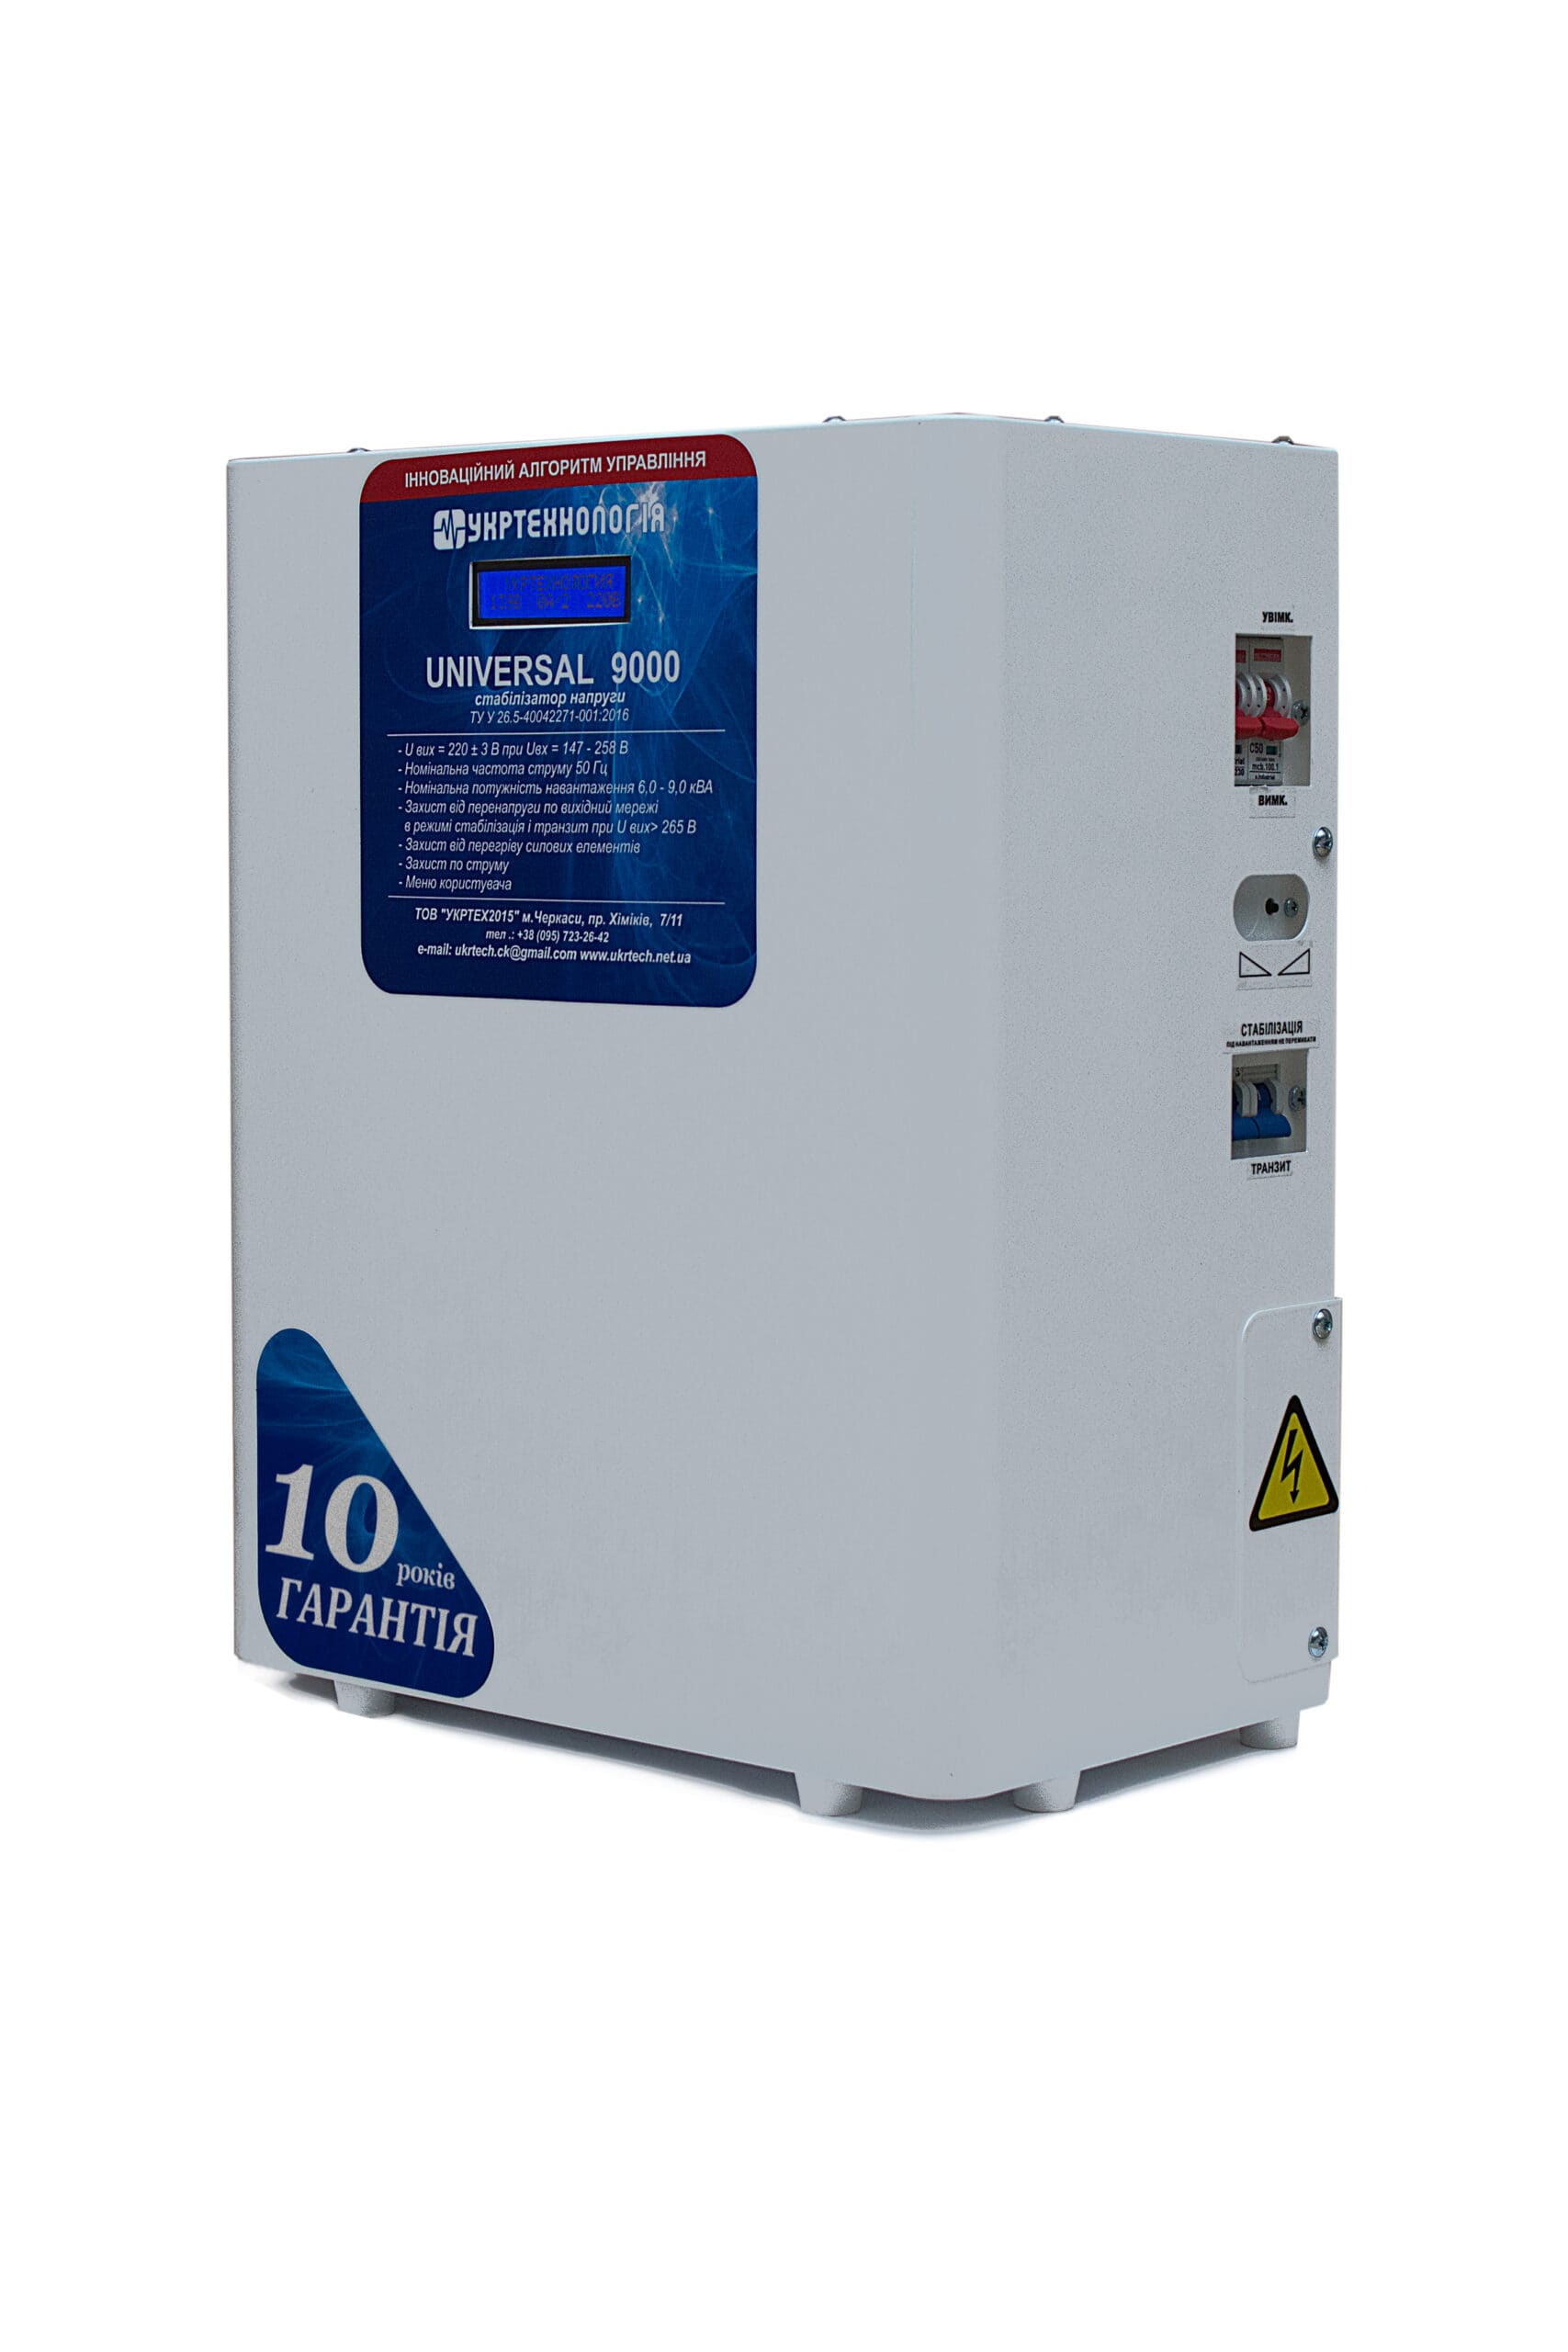 Стабилизаторы напряжения - Стабилизатор напряжения 9 кВт UNIVERSAL 000001419 - Фото 1